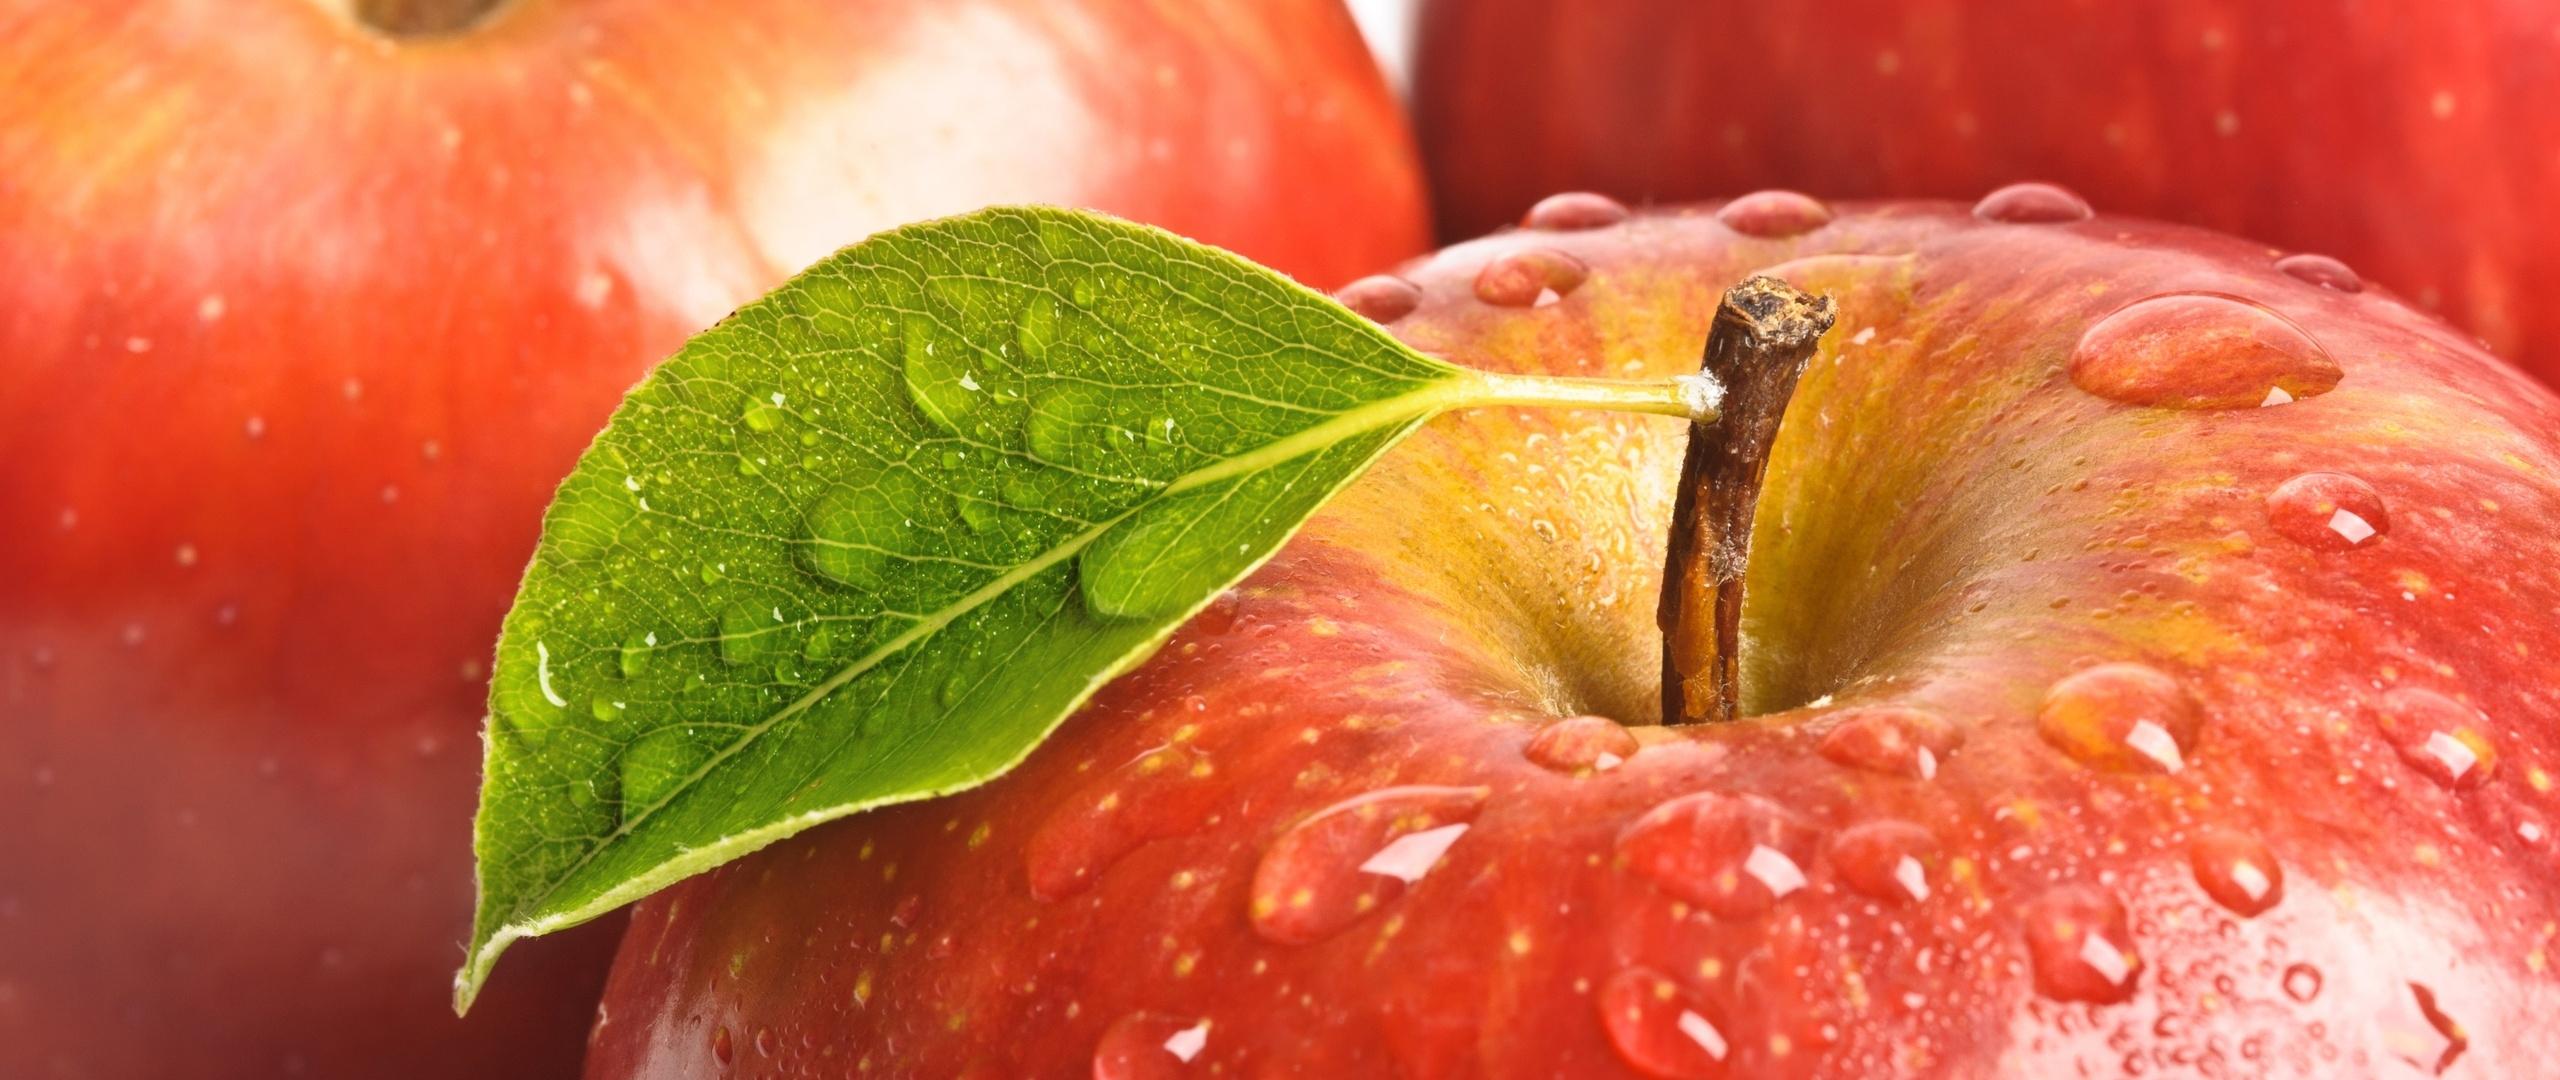 apple-closeup-1.jpg